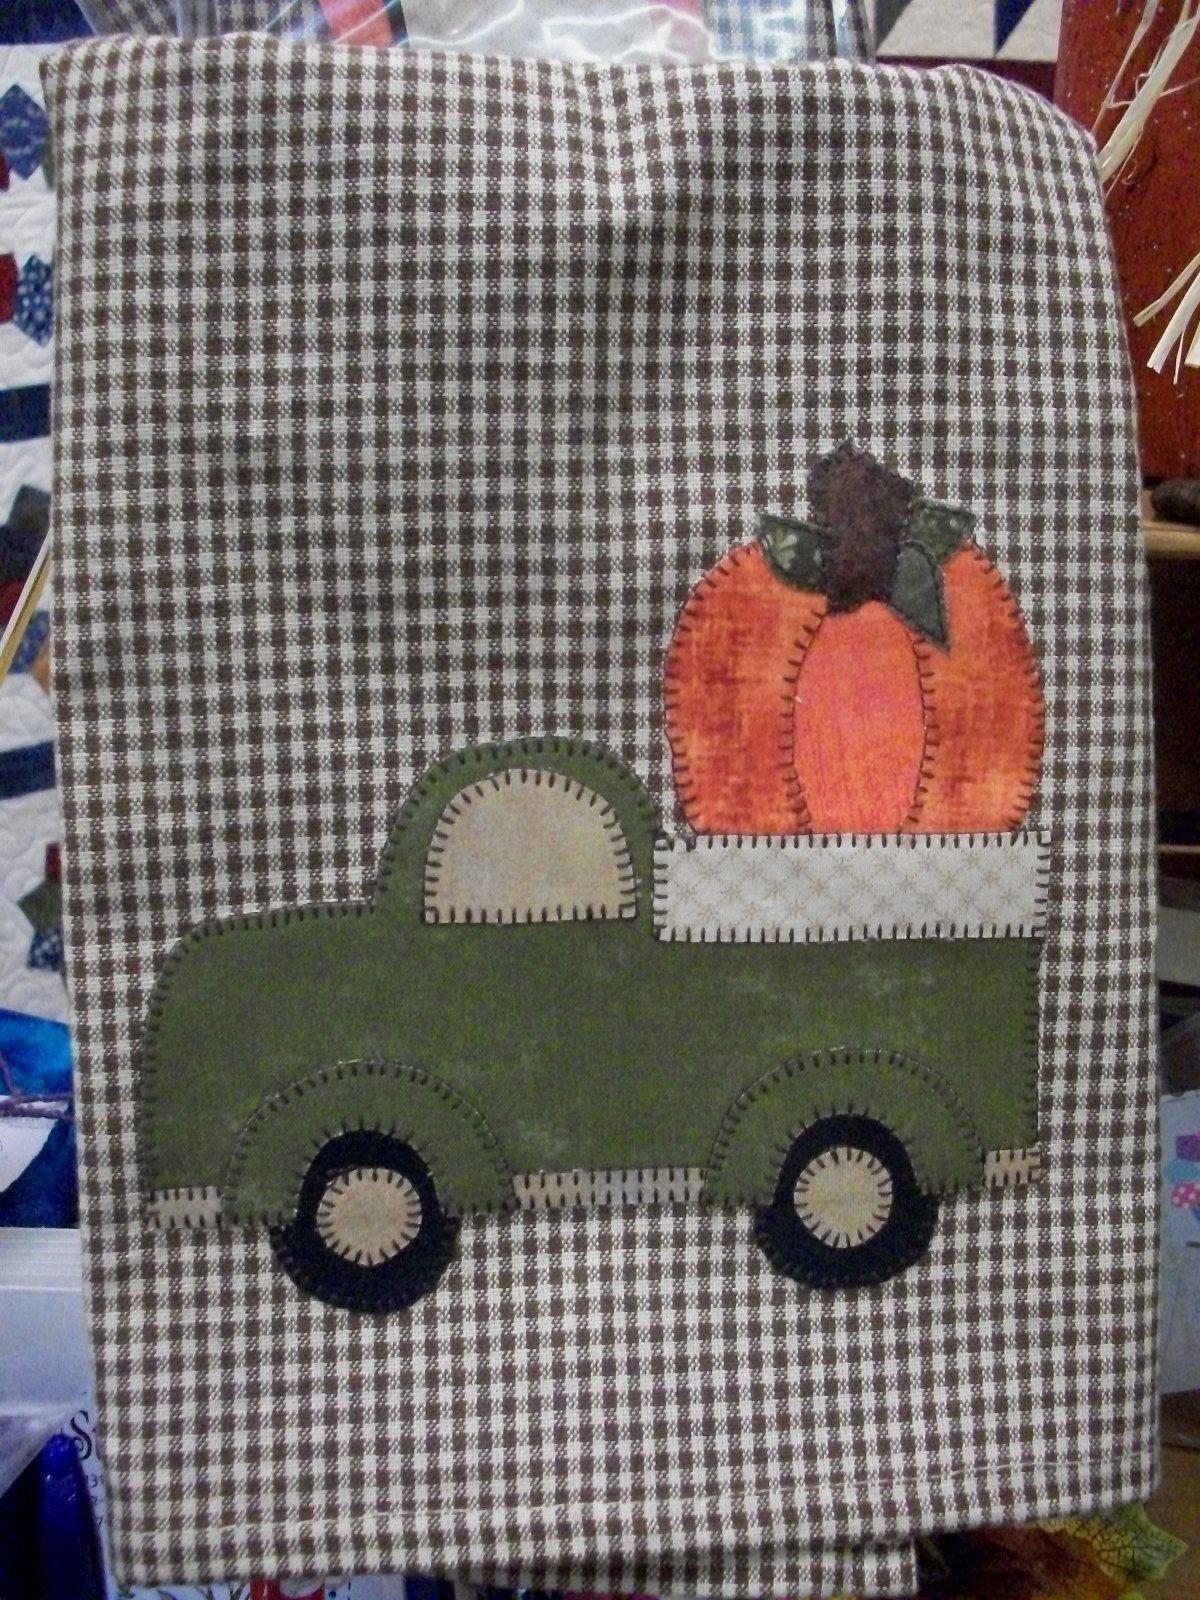 The Great Pumpkin Towel Kit